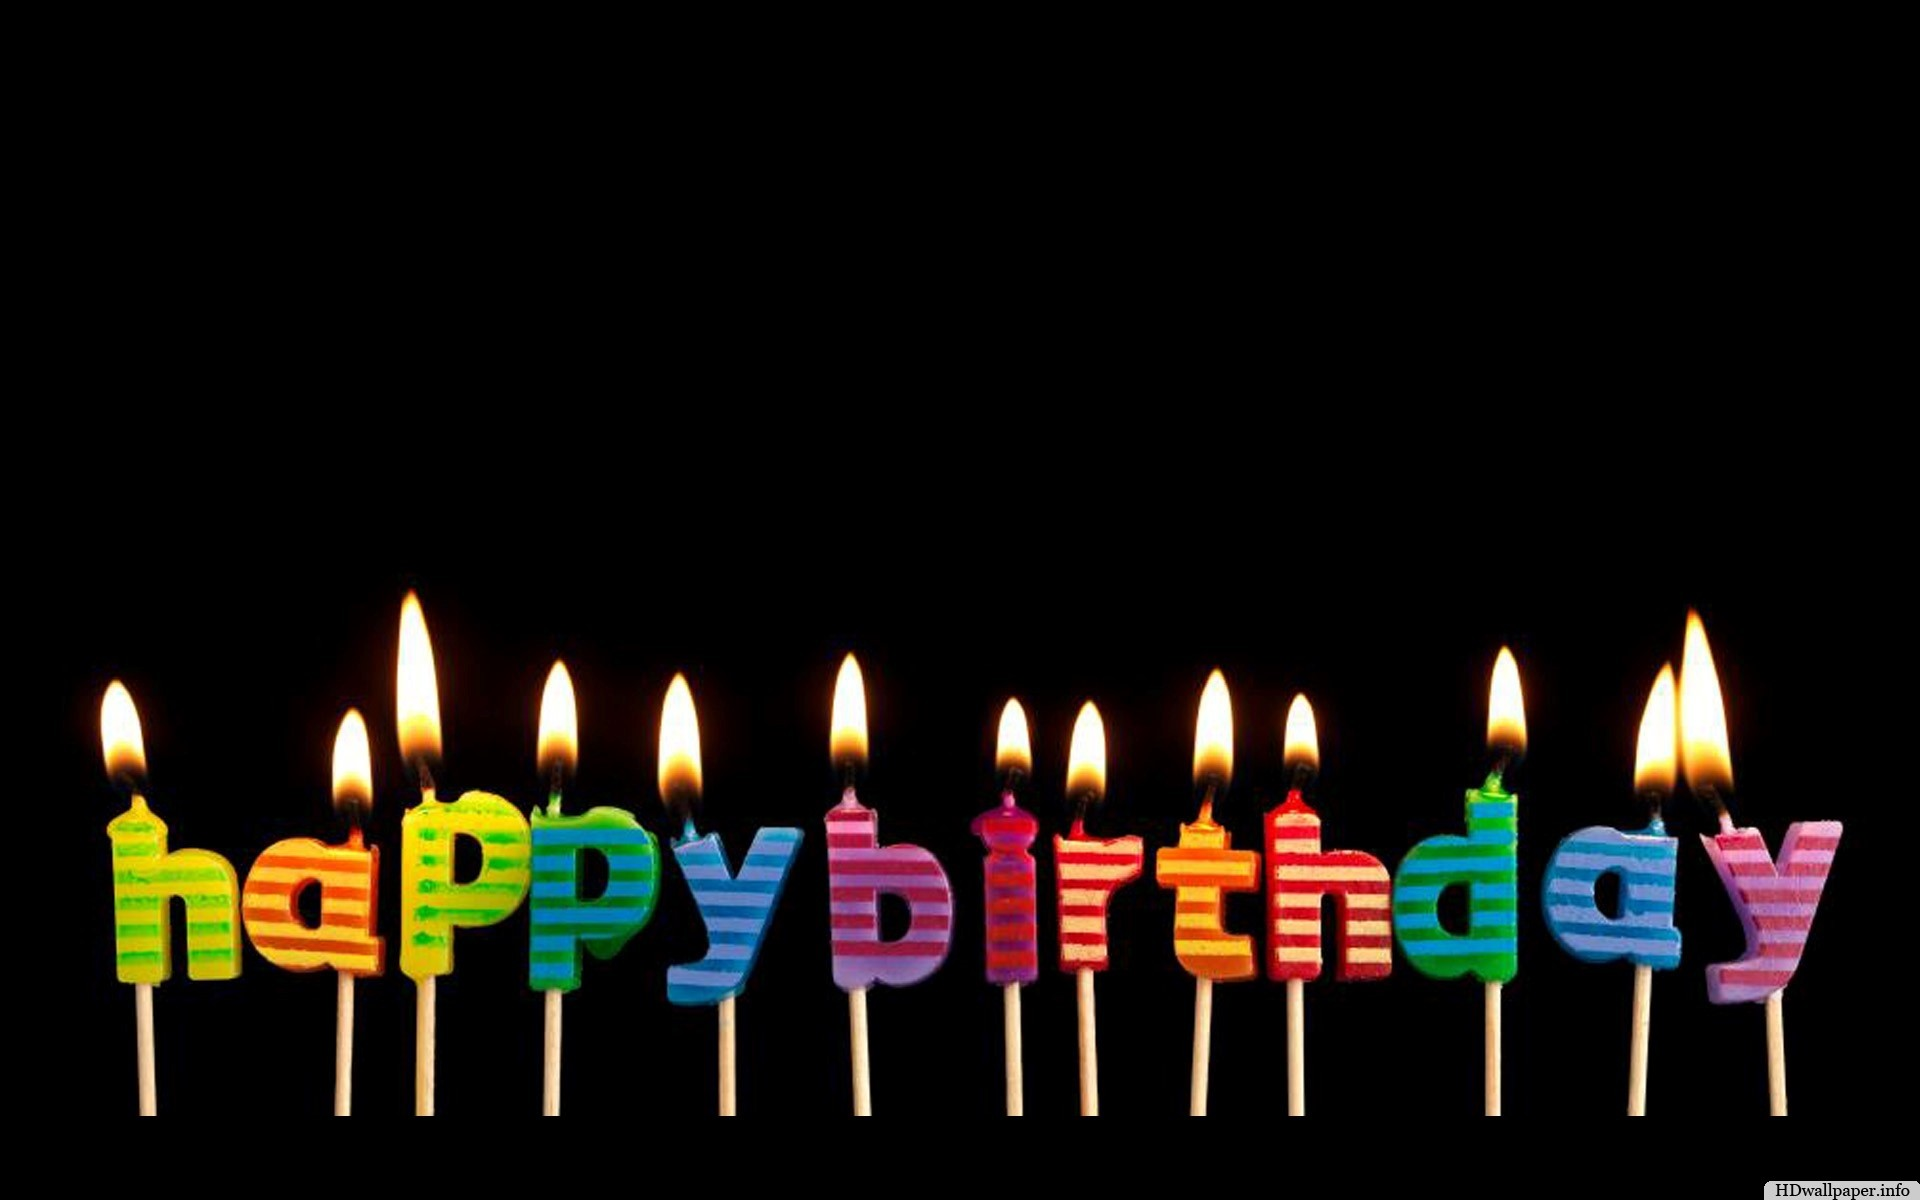 Happy Birthday Desktop Wallpaper – https://hdwallpaper.info/happy-birthday